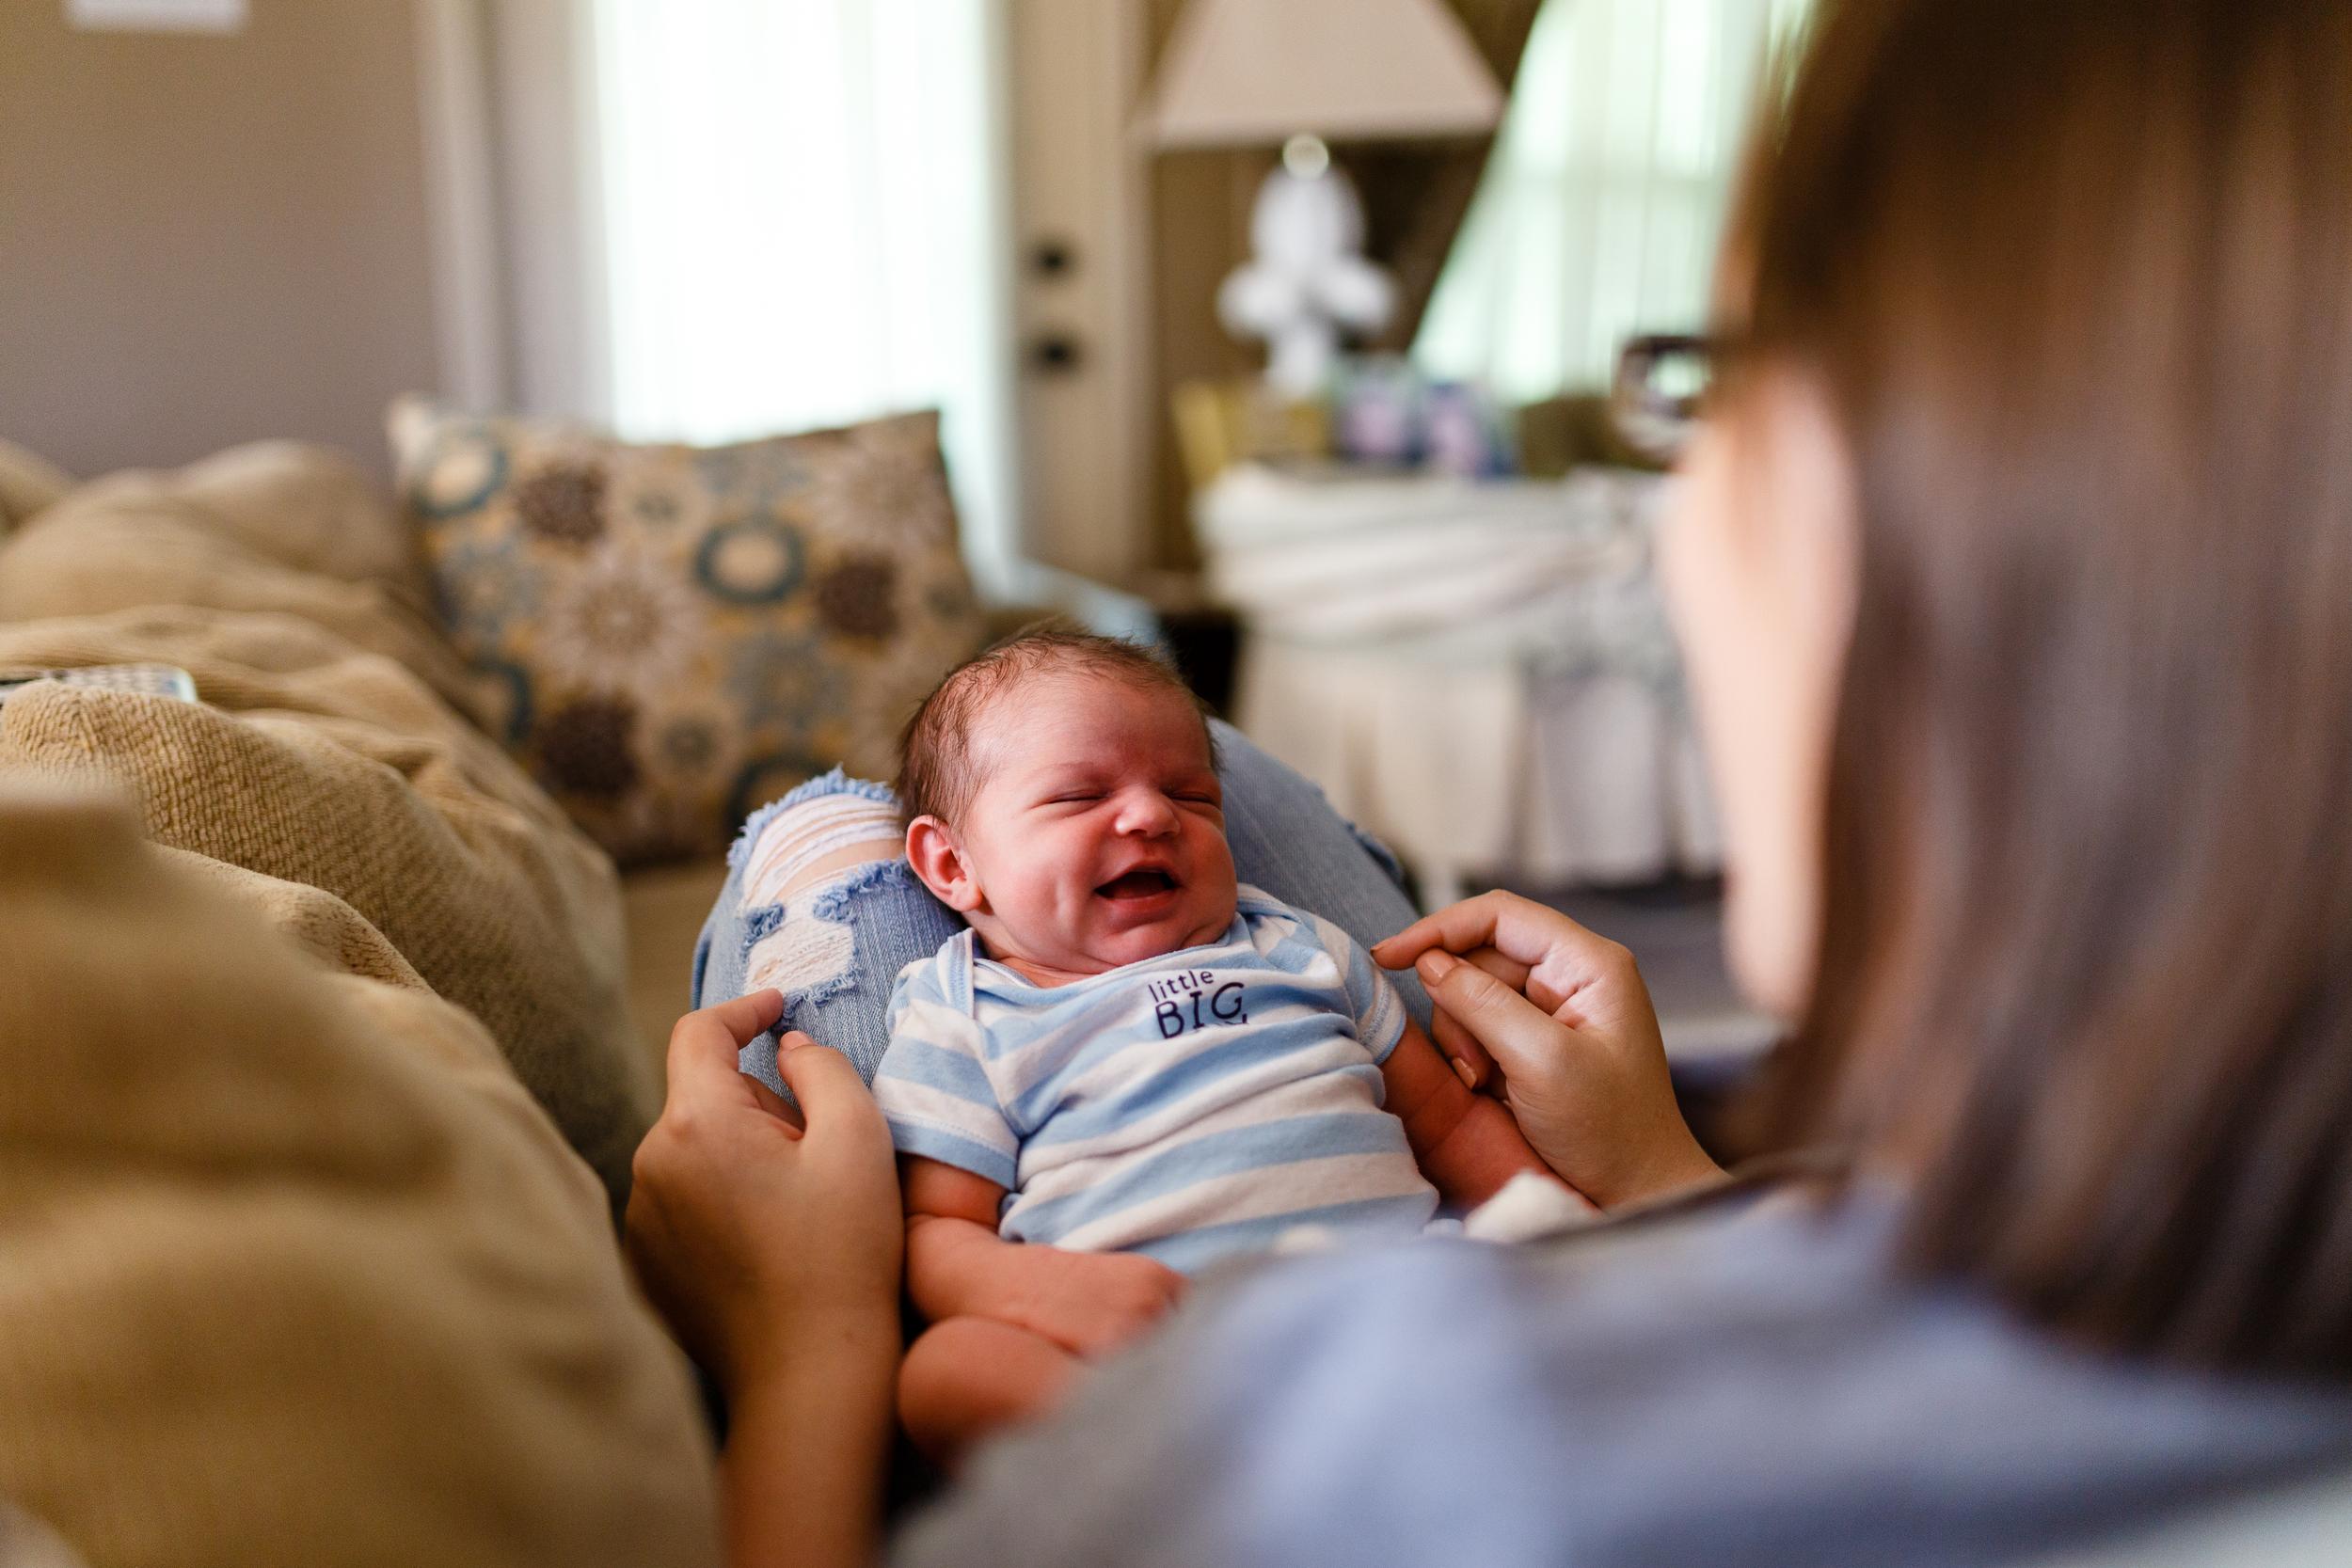 Newborn-baby-lifestyle-portrait-lafayette-broussard-youngsville-photographer-4.jpg